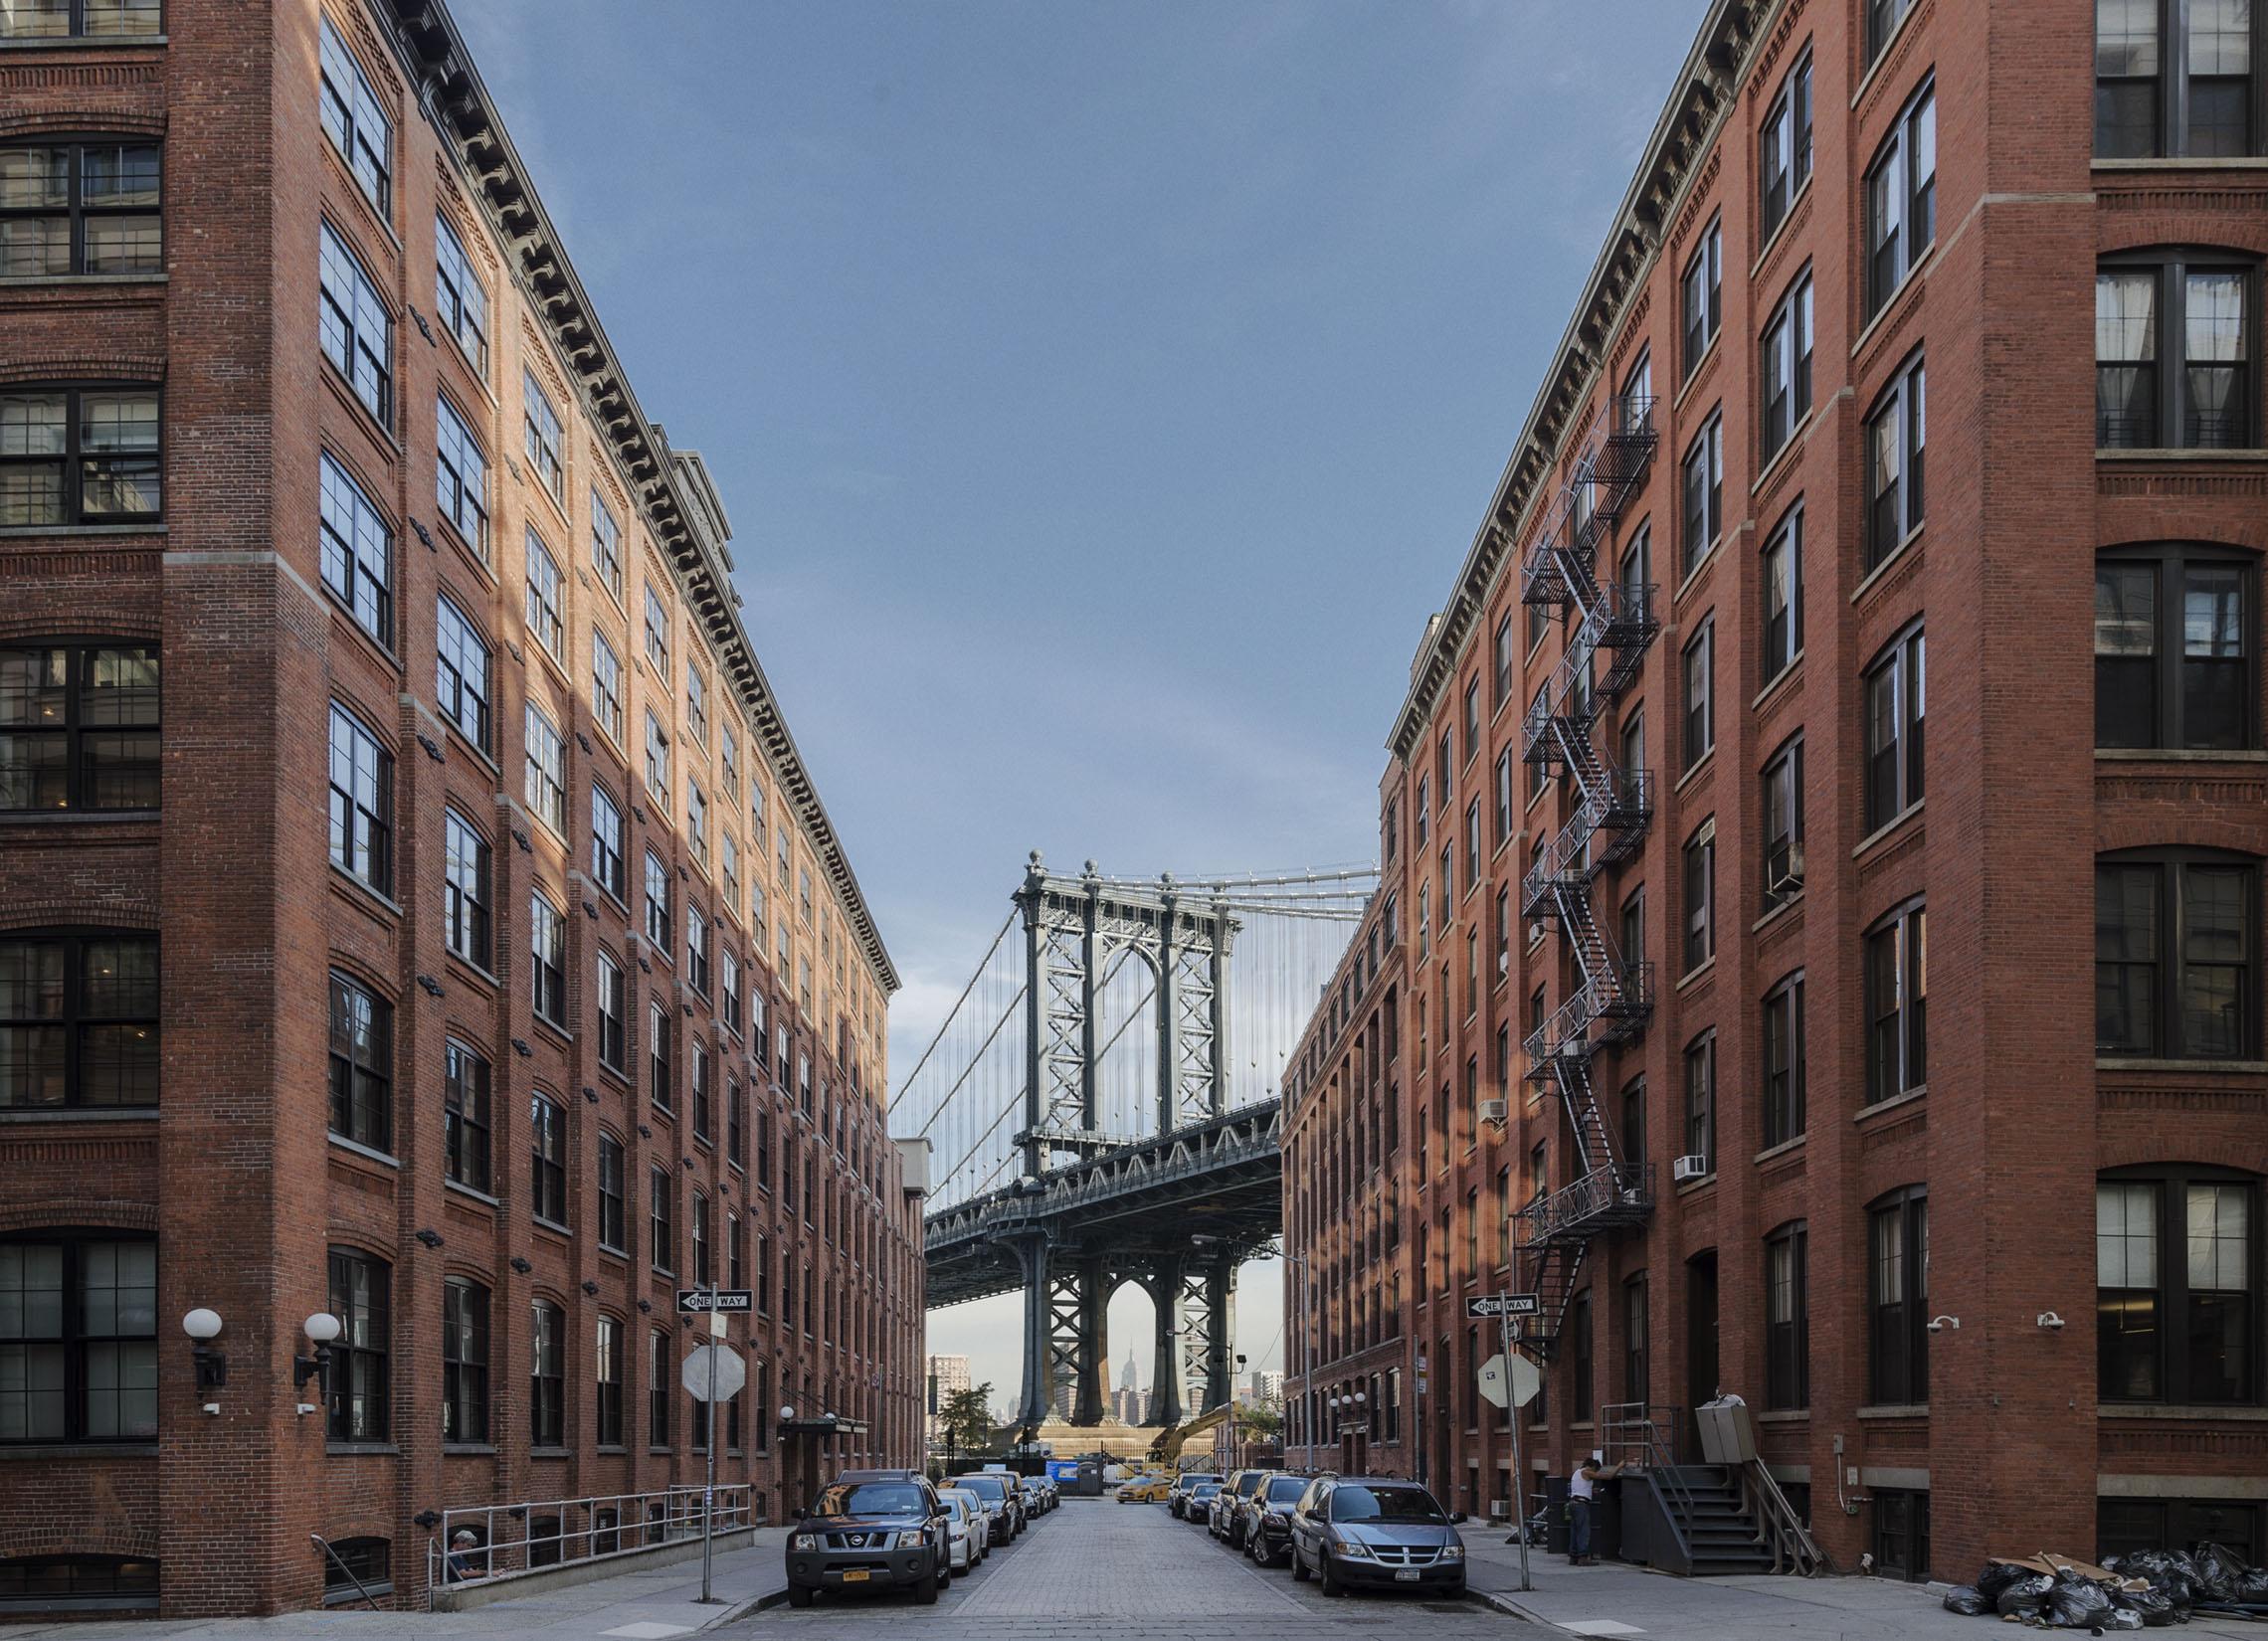 The DUMBO neighborhood of Brooklyn, see from under the Manhattan Bridge.